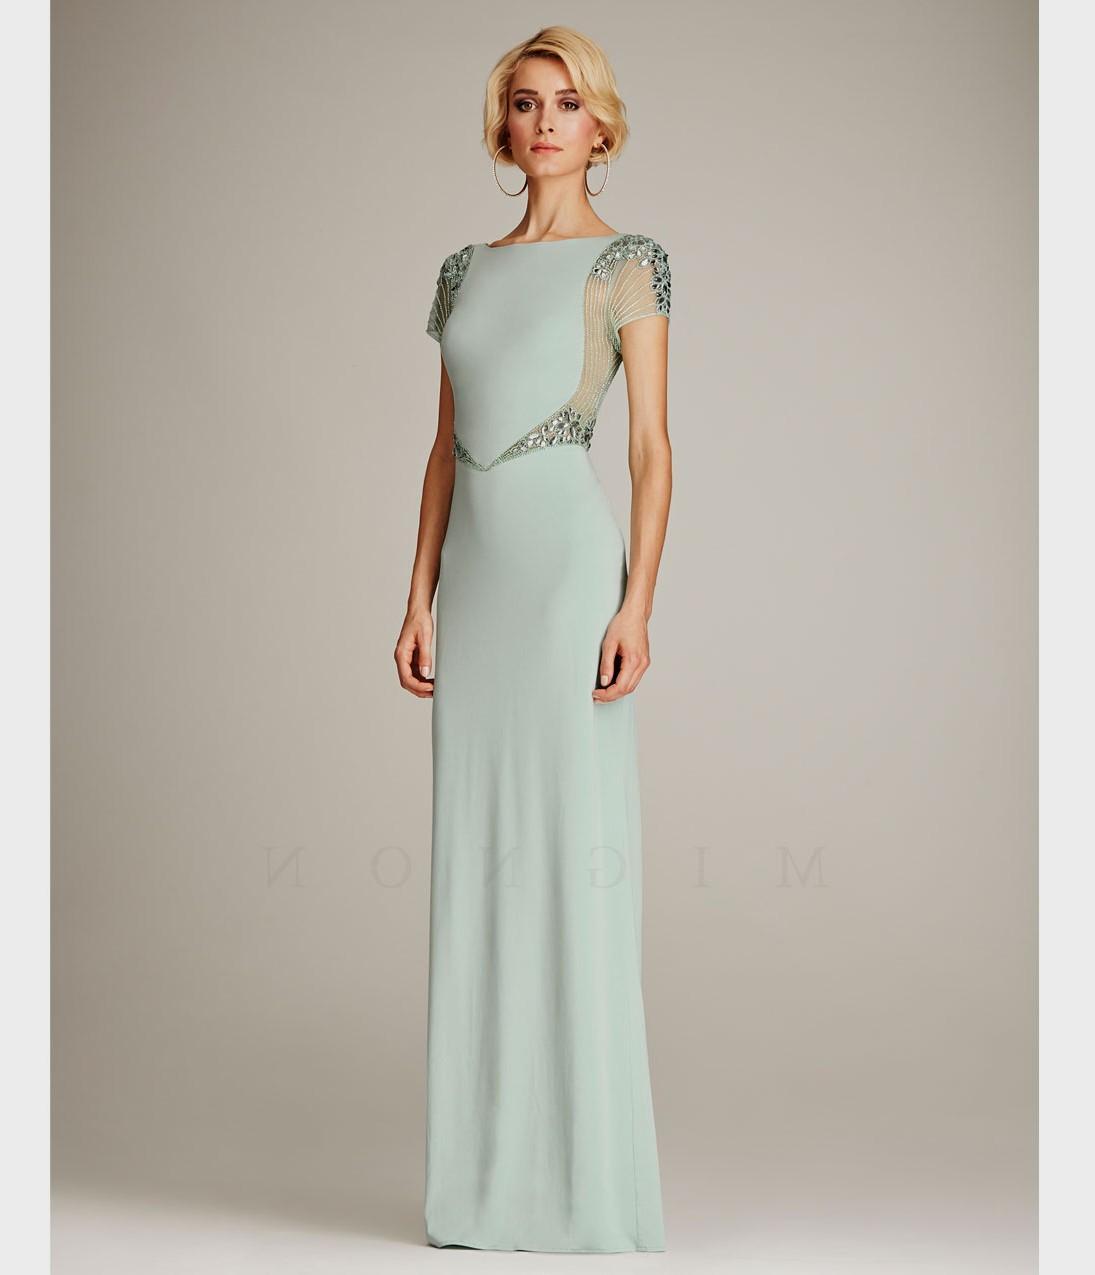 1930 evening dresses photo - 1